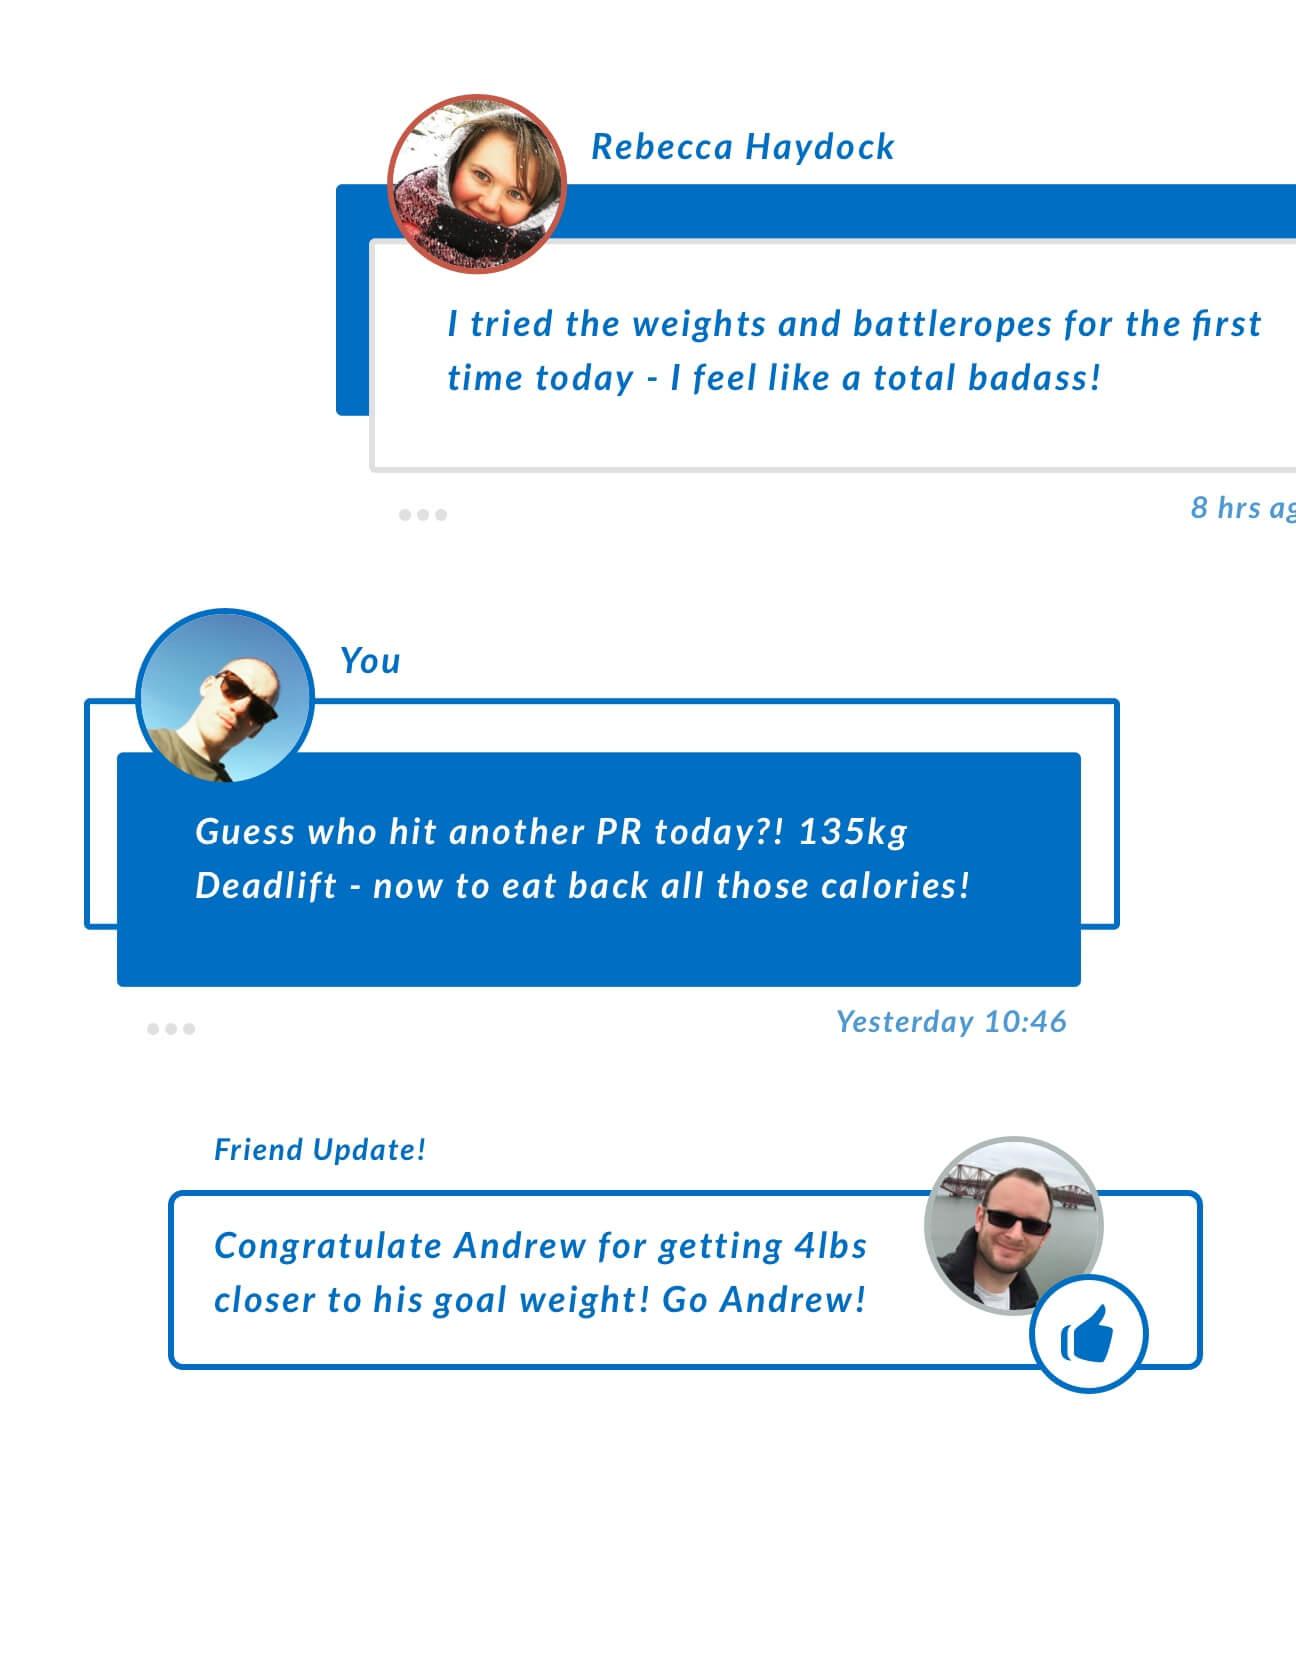 User and friend status designs